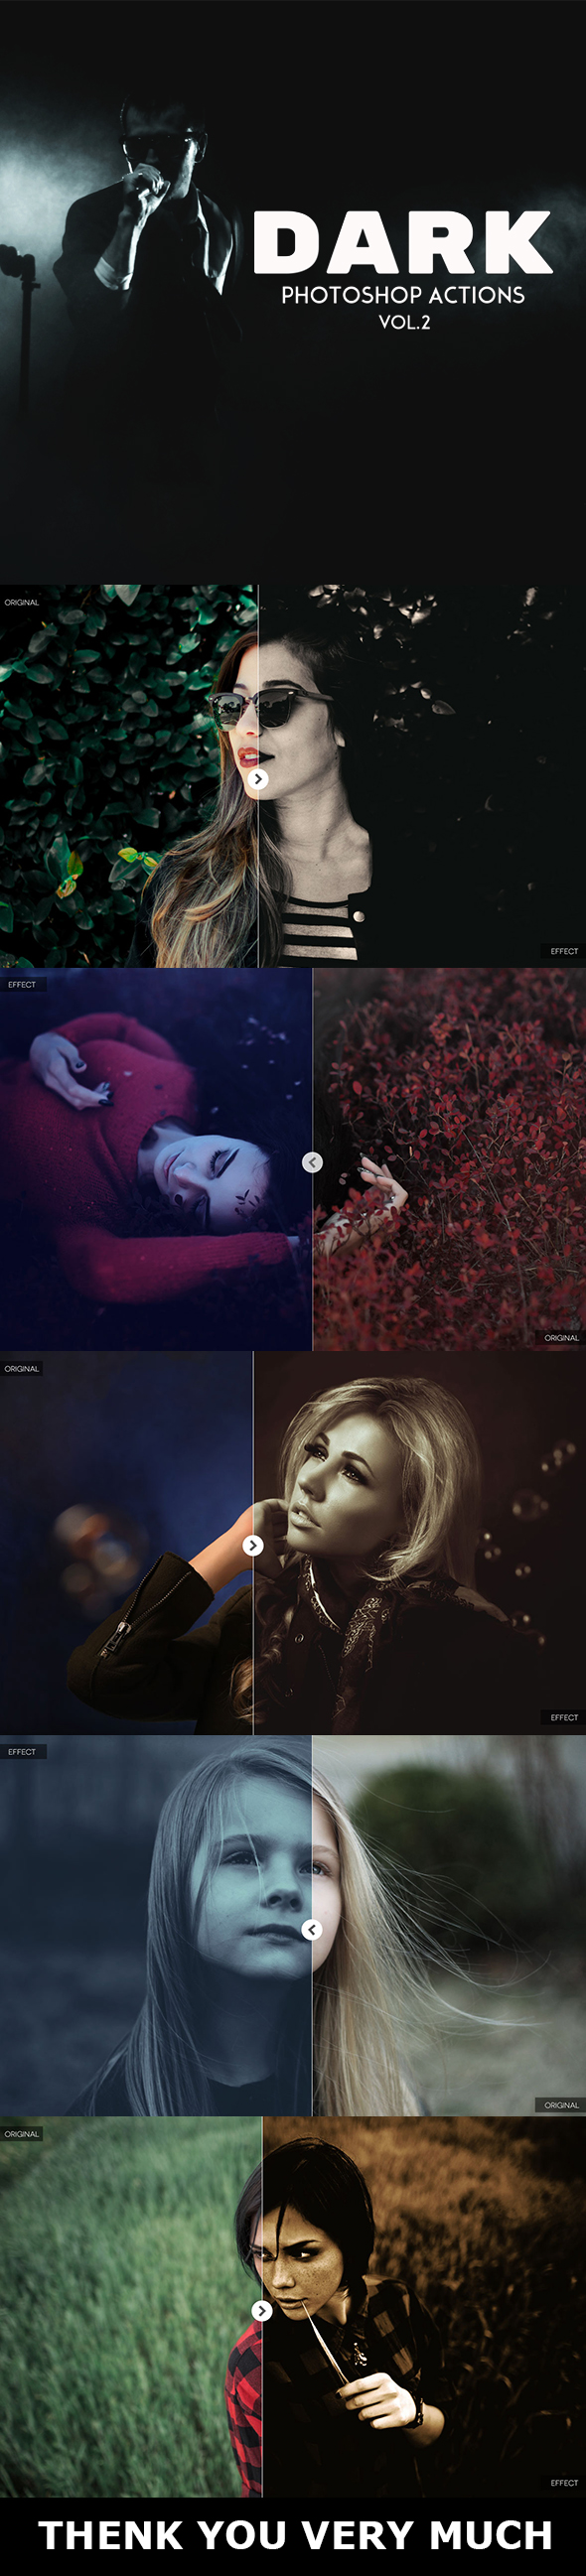 GraphicRiver Dark Photoshop Actions Vol.2 20474761